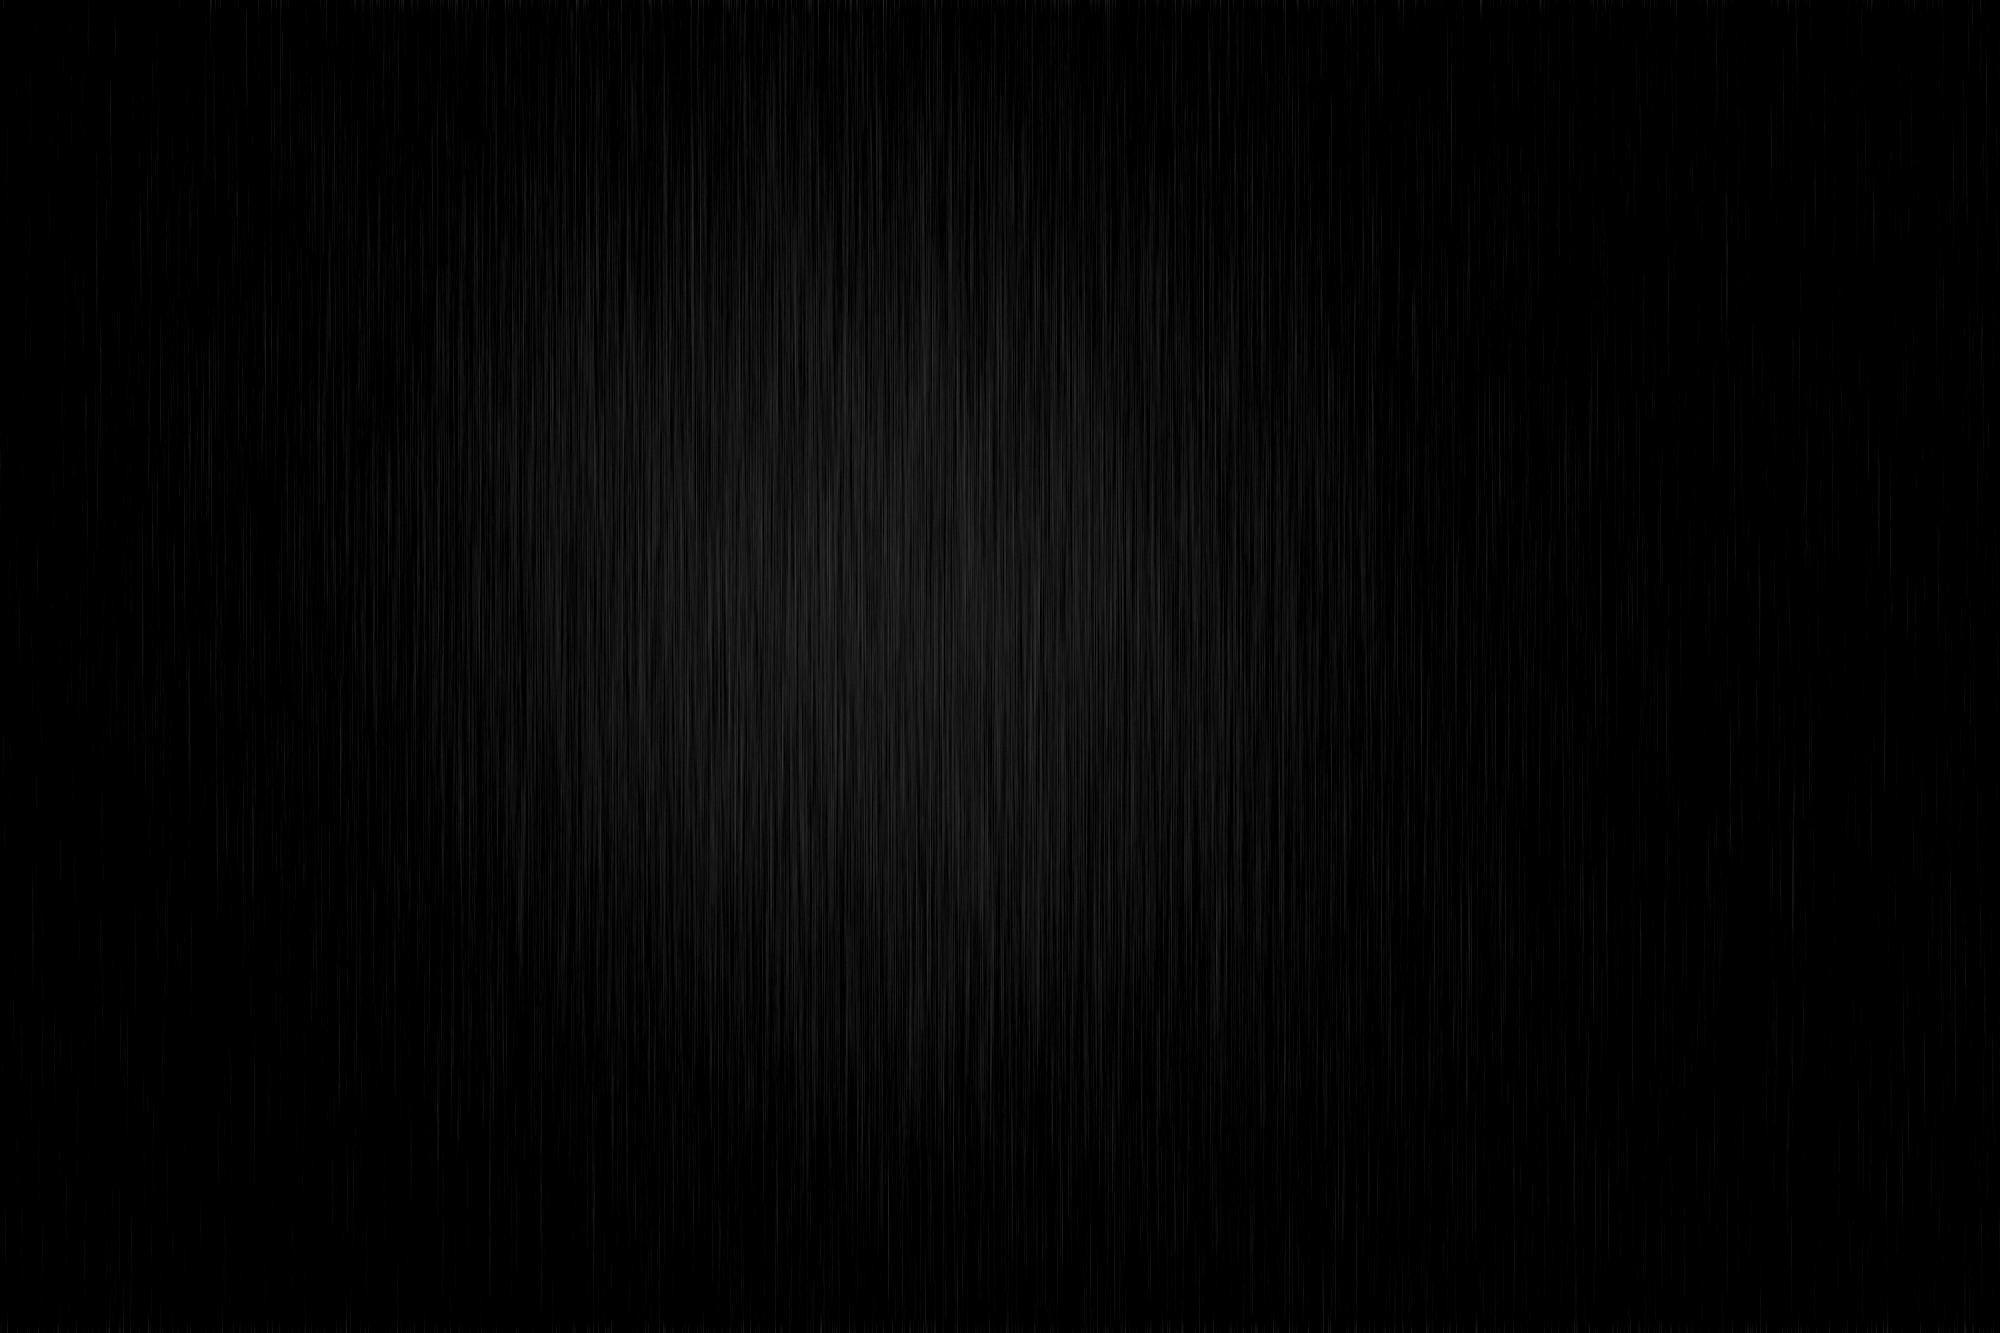 Plain Black Wallpapers Wide As Wallpaper HD